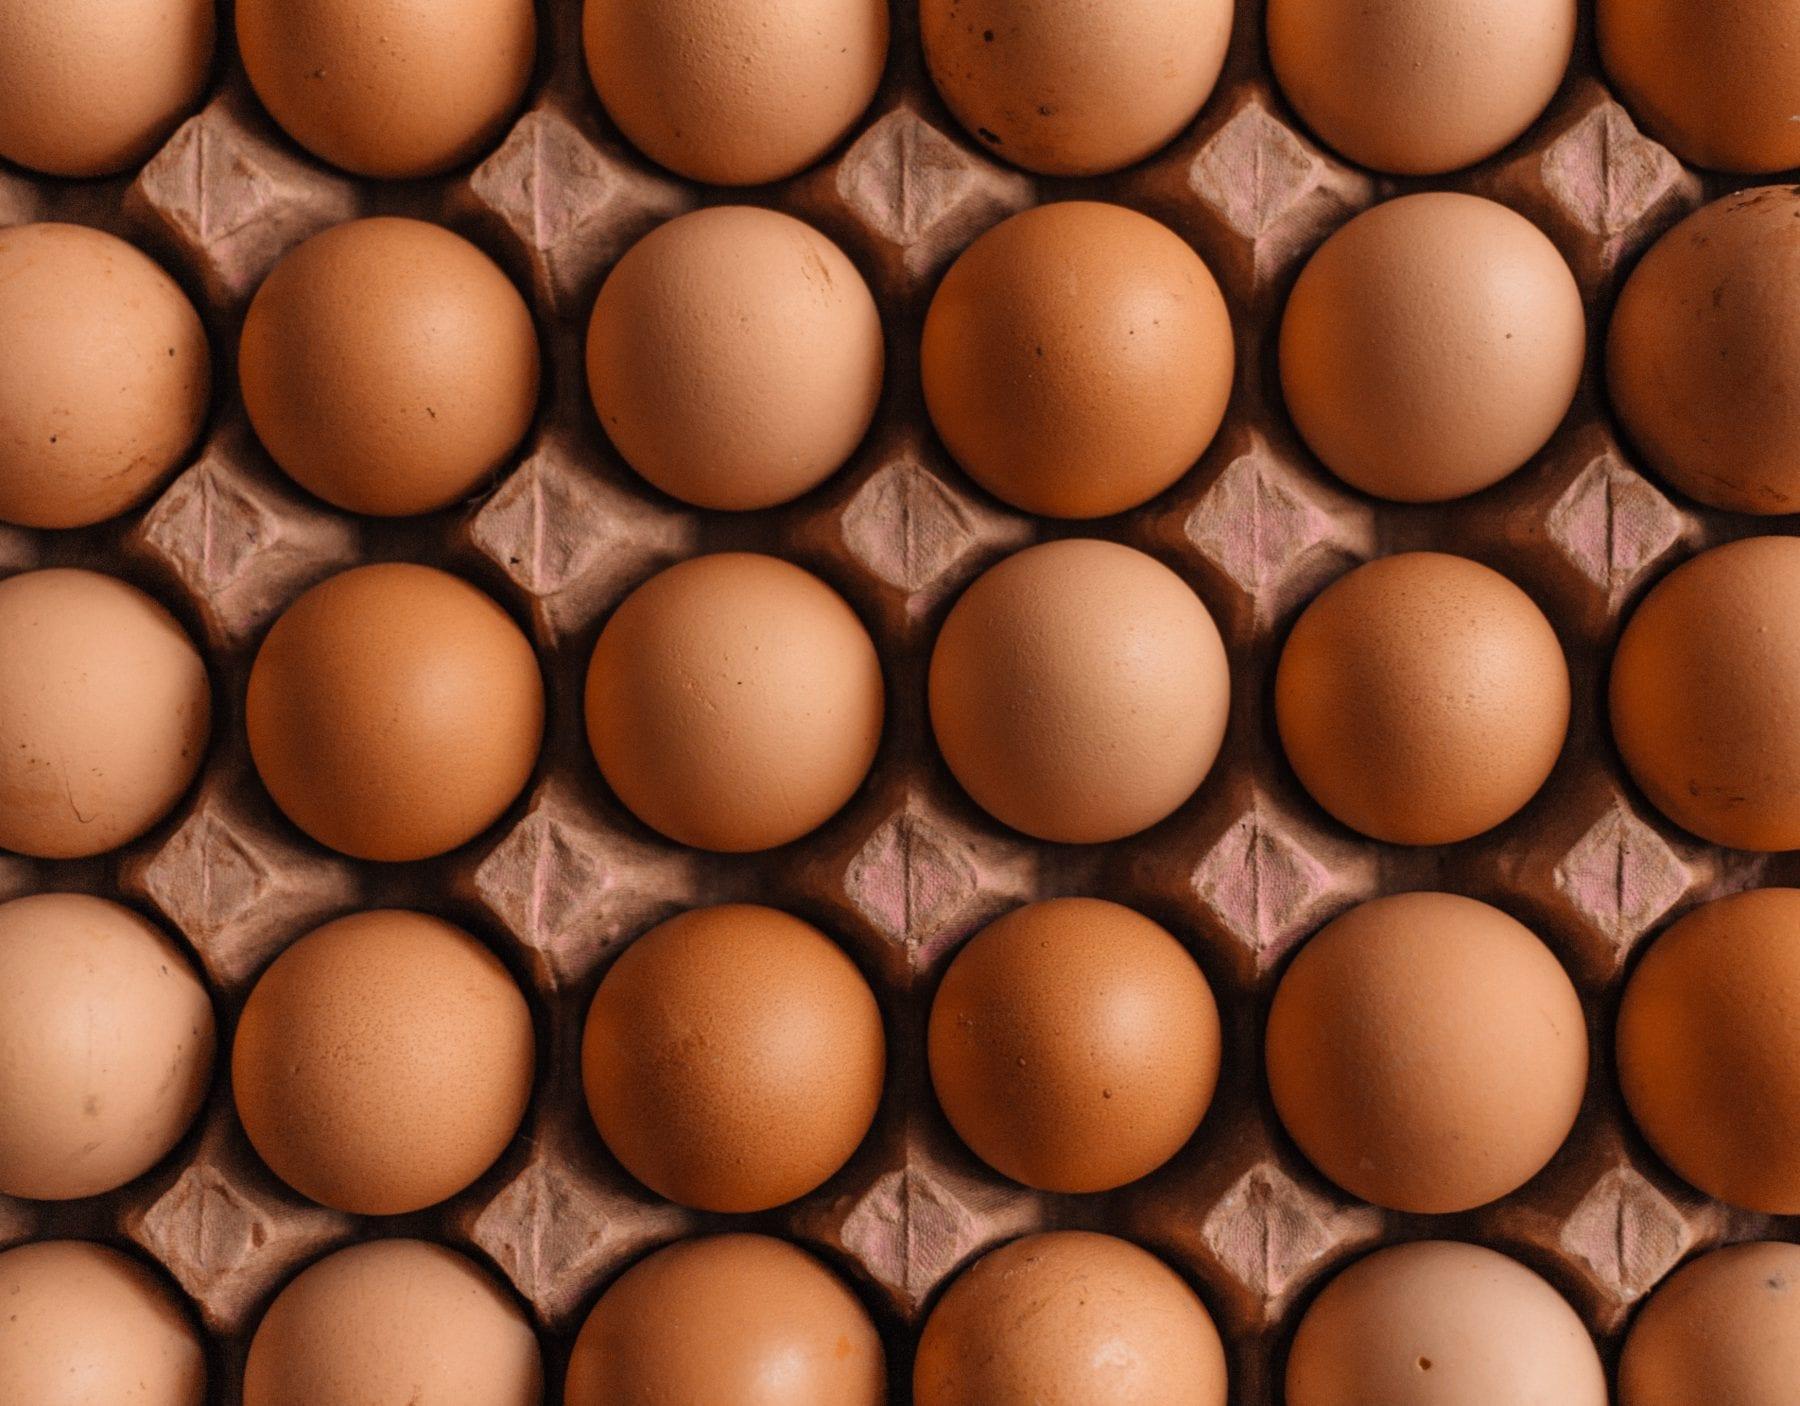 magere eiwitbronnen